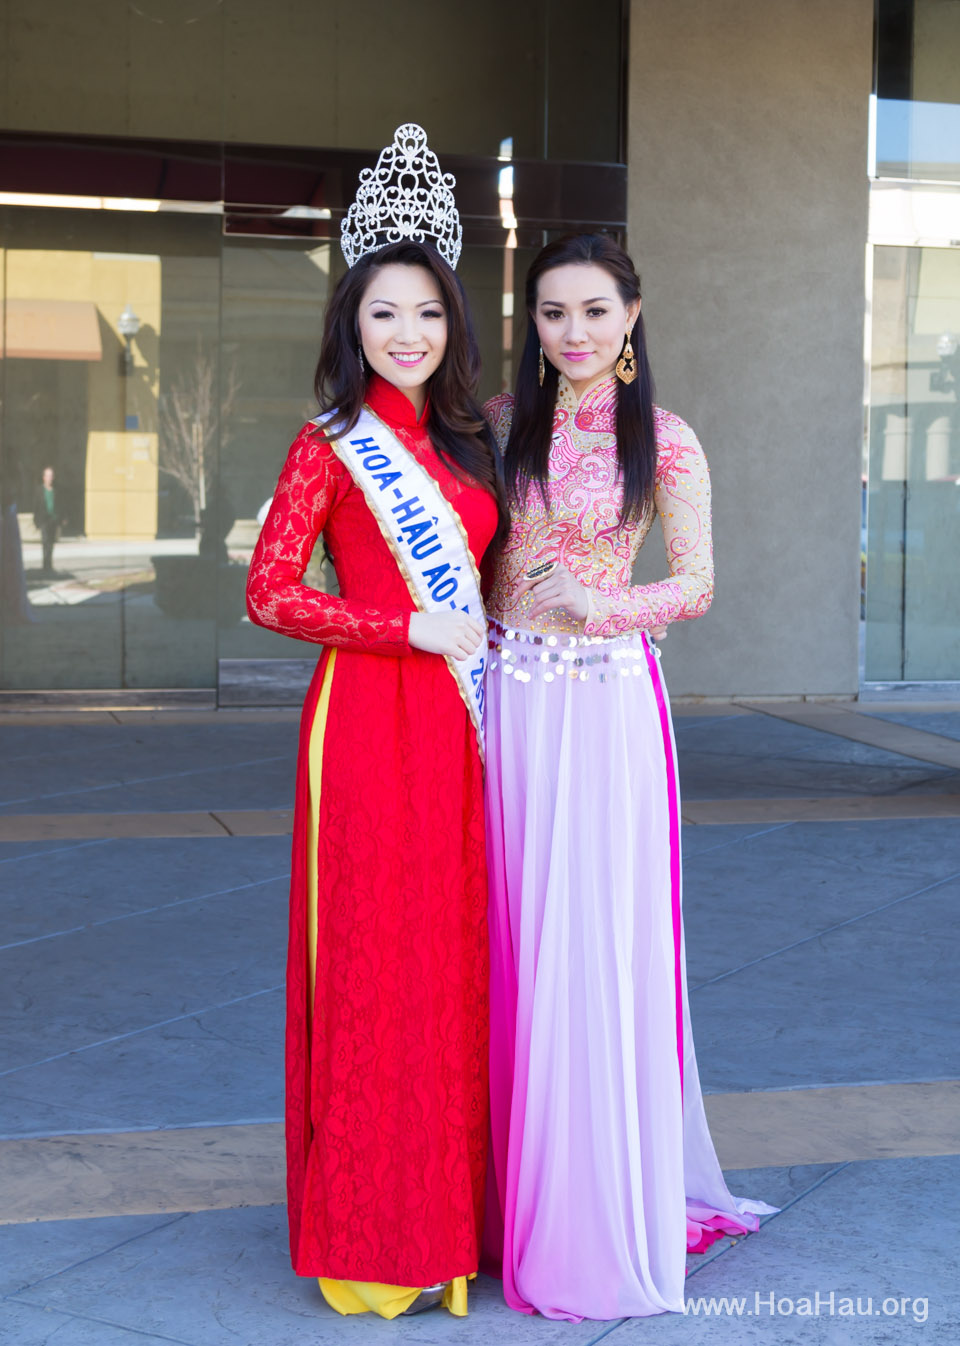 Tet Festival 2014 at Vietnam Town - Hoa Hau - Miss Vietnam - Image 125